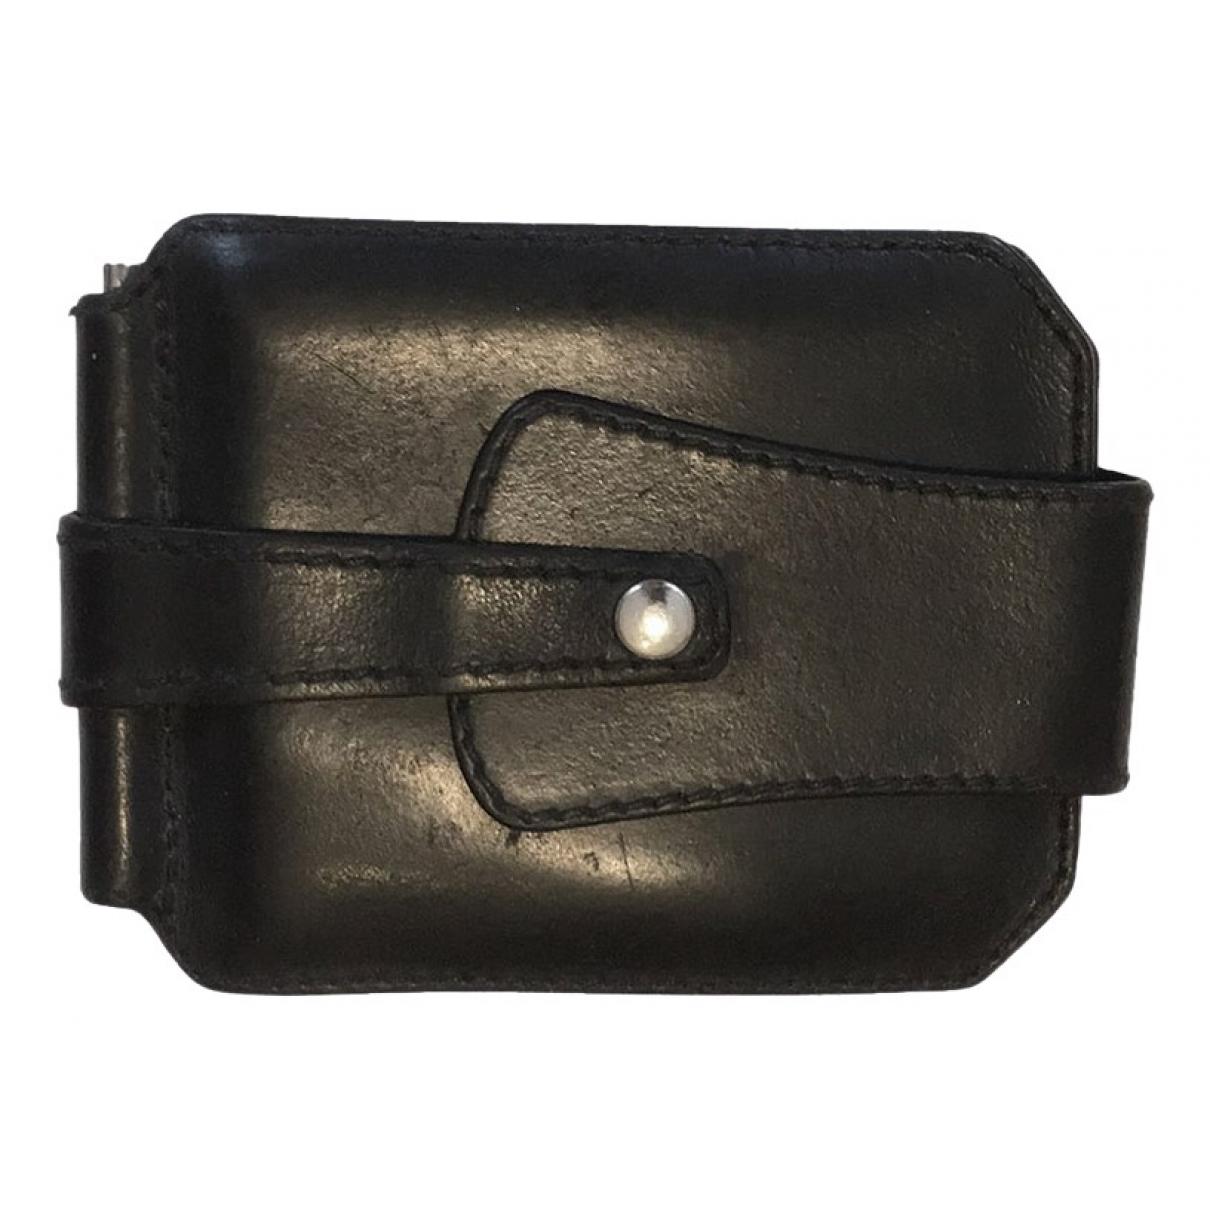 Raf Simons \N Black Leather Small bag, wallet & cases for Men \N